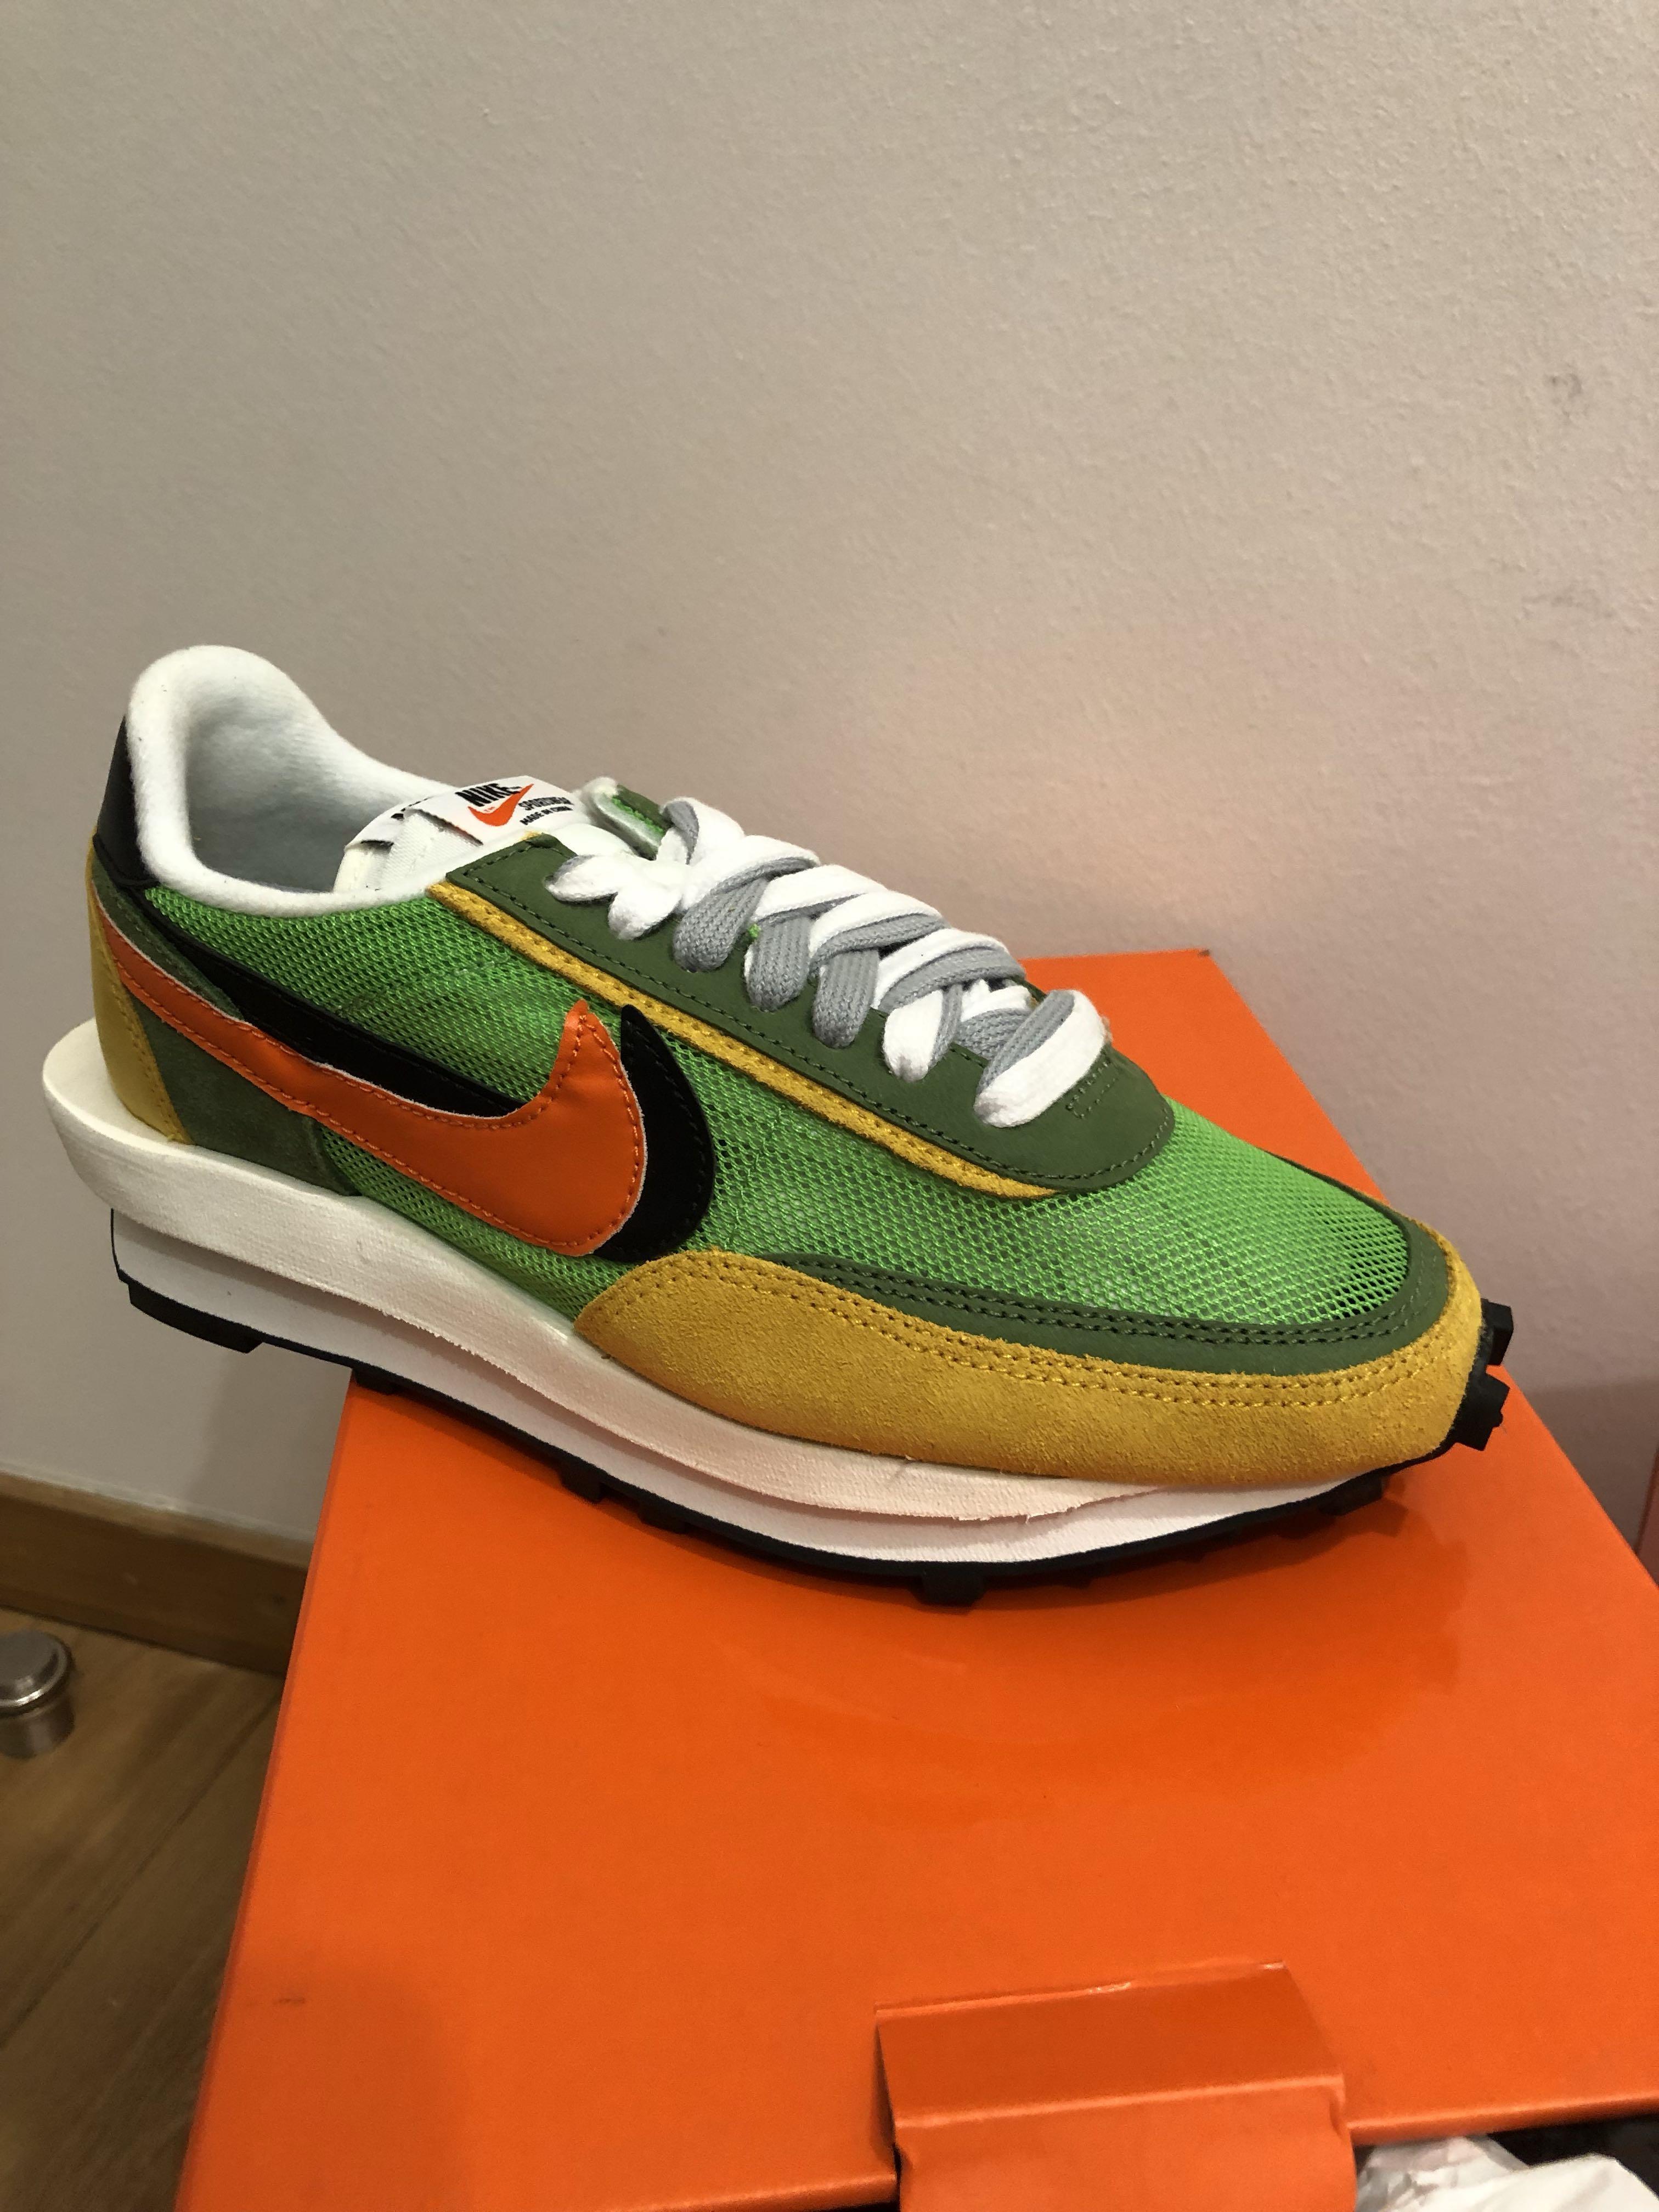 meilleur authentique 5fd0c 93cdc Nike LD Waffle Sacai Green Multi US 6 UK 5.5, Men's Fashion ...